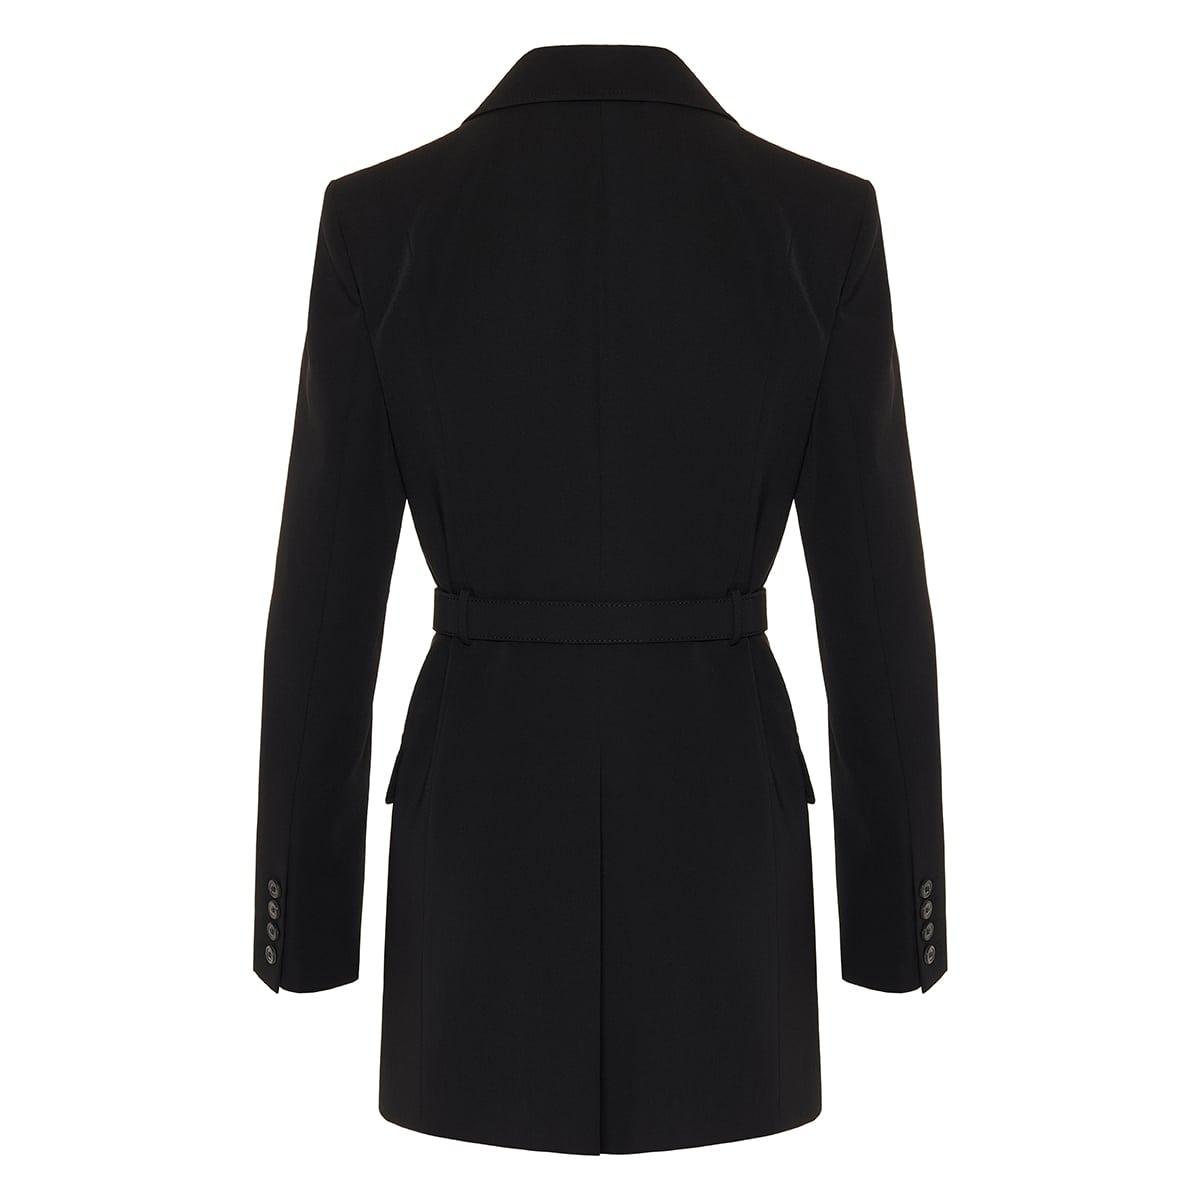 Belted wool jacket